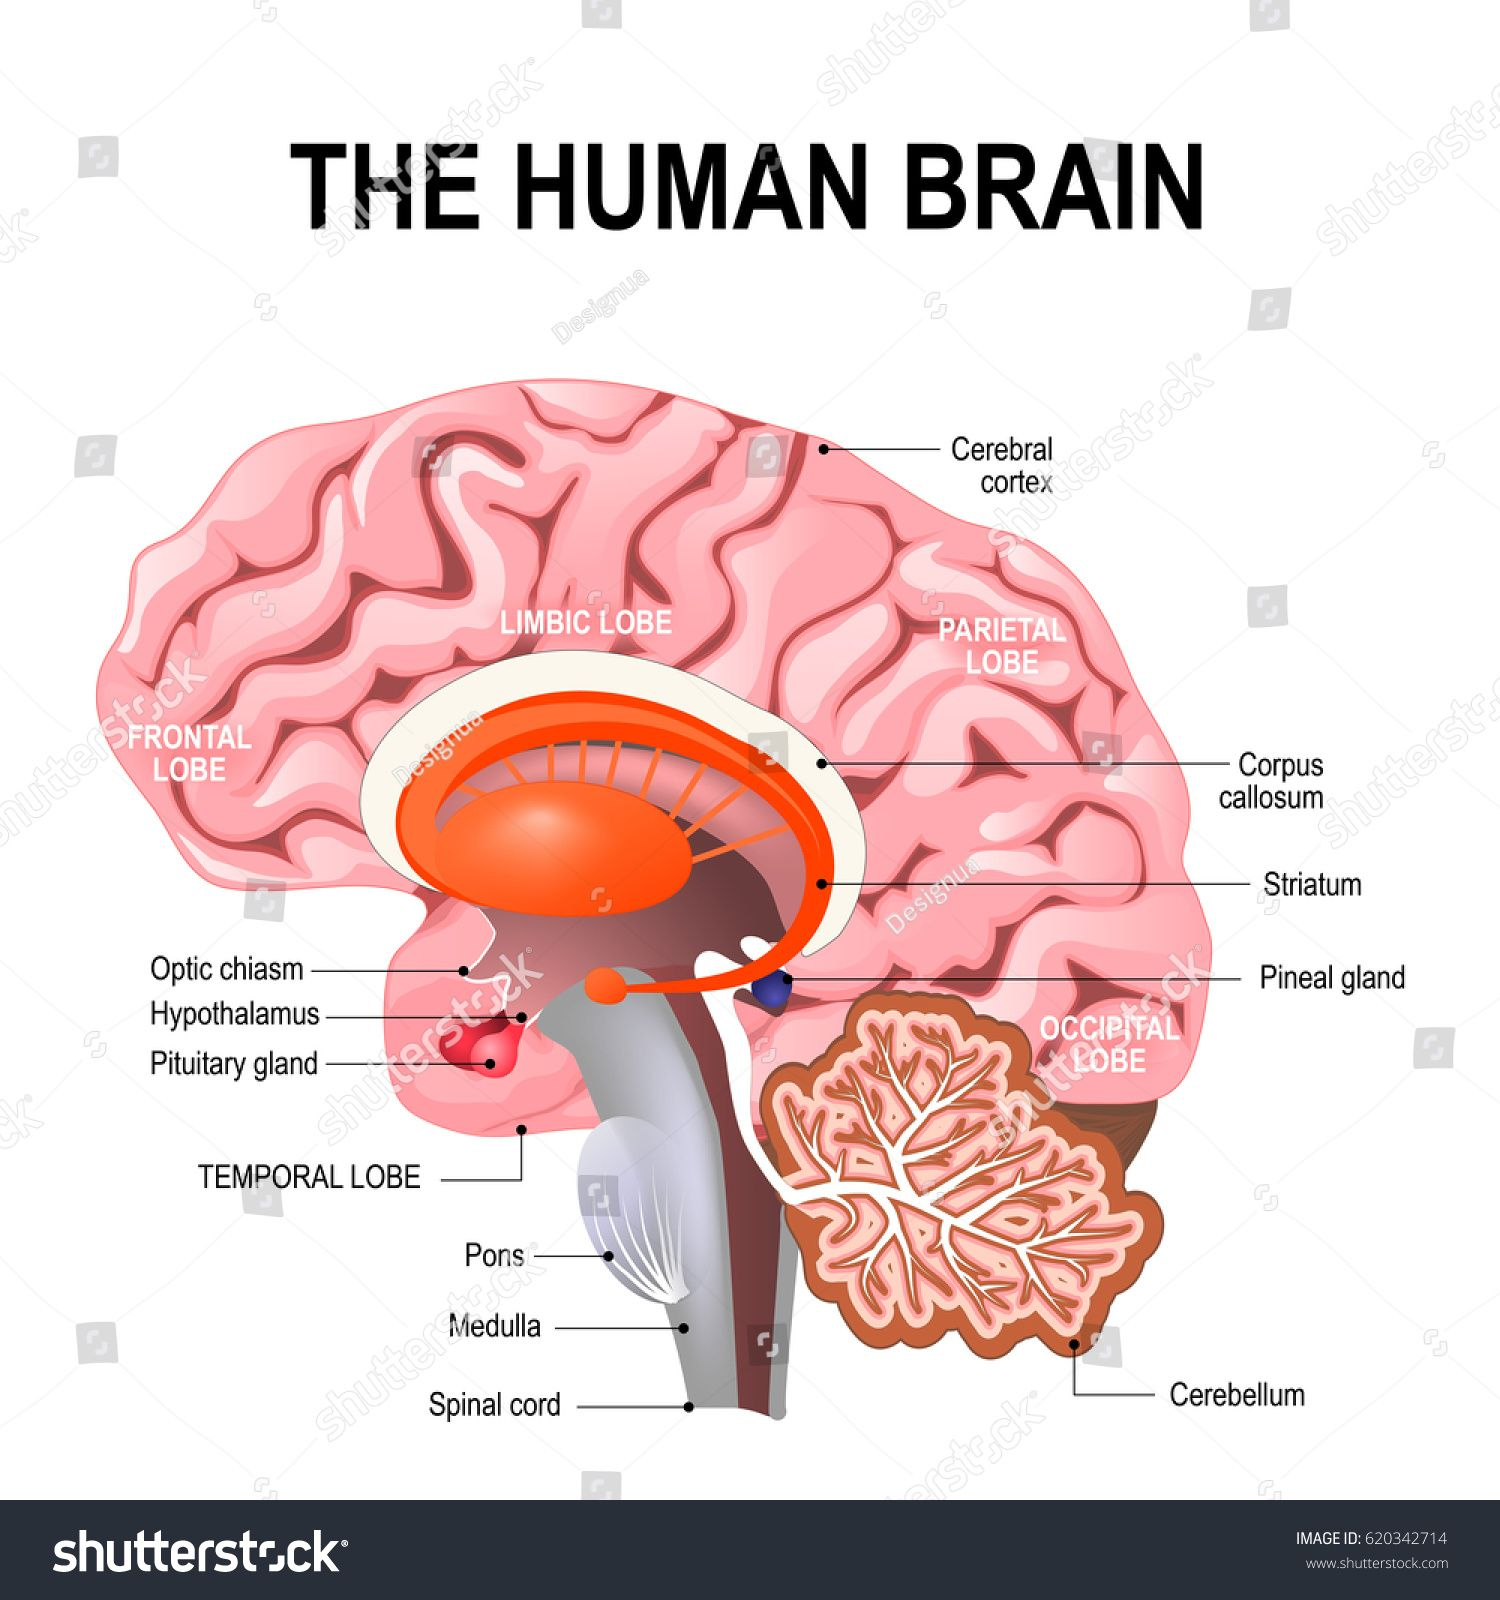 Detailed Anatomy Of The Human Brain Illustration Showing The Medulla Pons Cerebellum Hypothalamus Thala Brain Illustration Human Brain Human Brain Anatomy